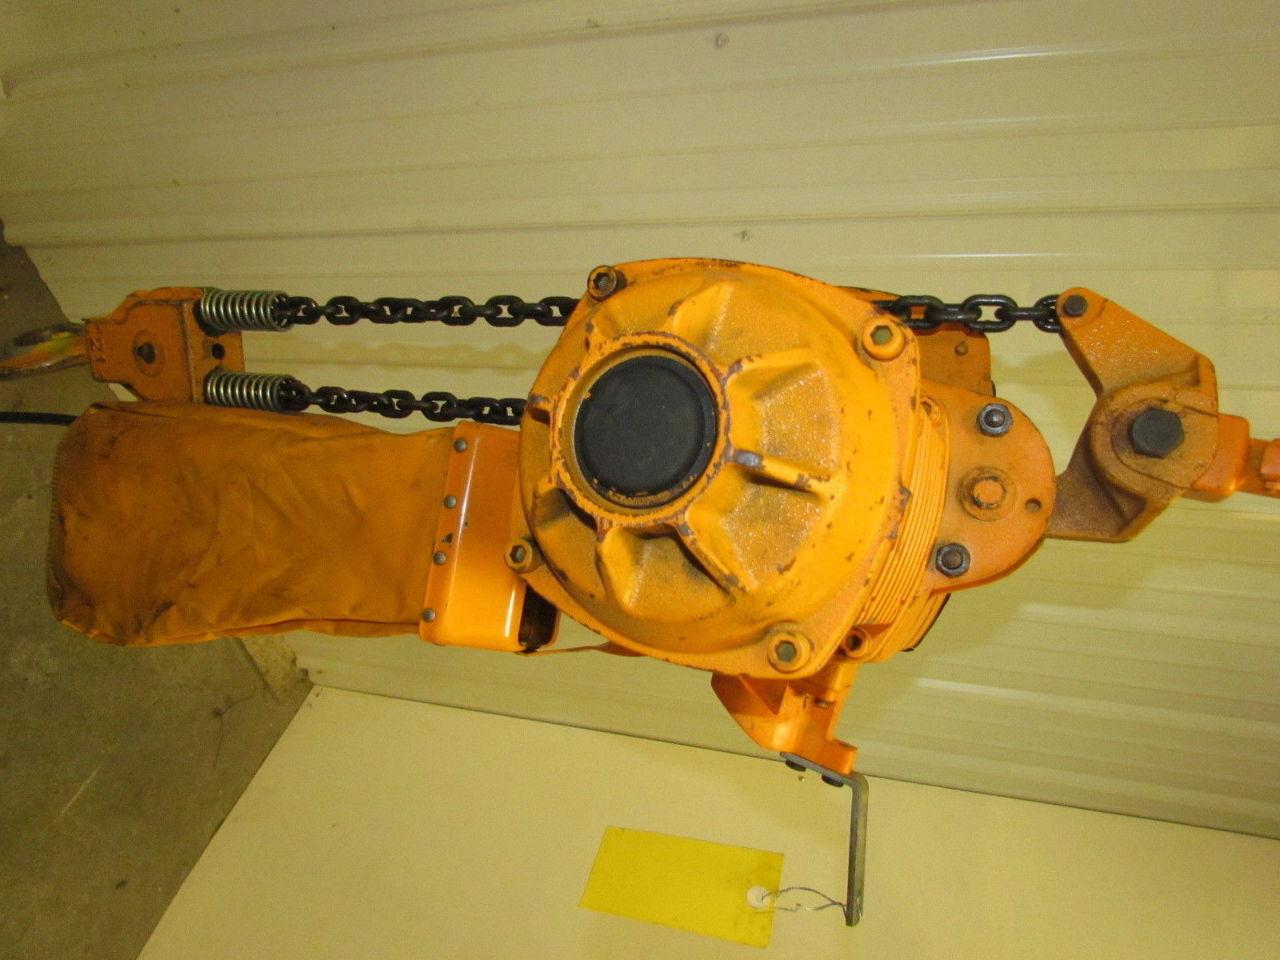 Harrington 2 Ton 3 Ph Electric Chain Hoist 15 39 6 Travel